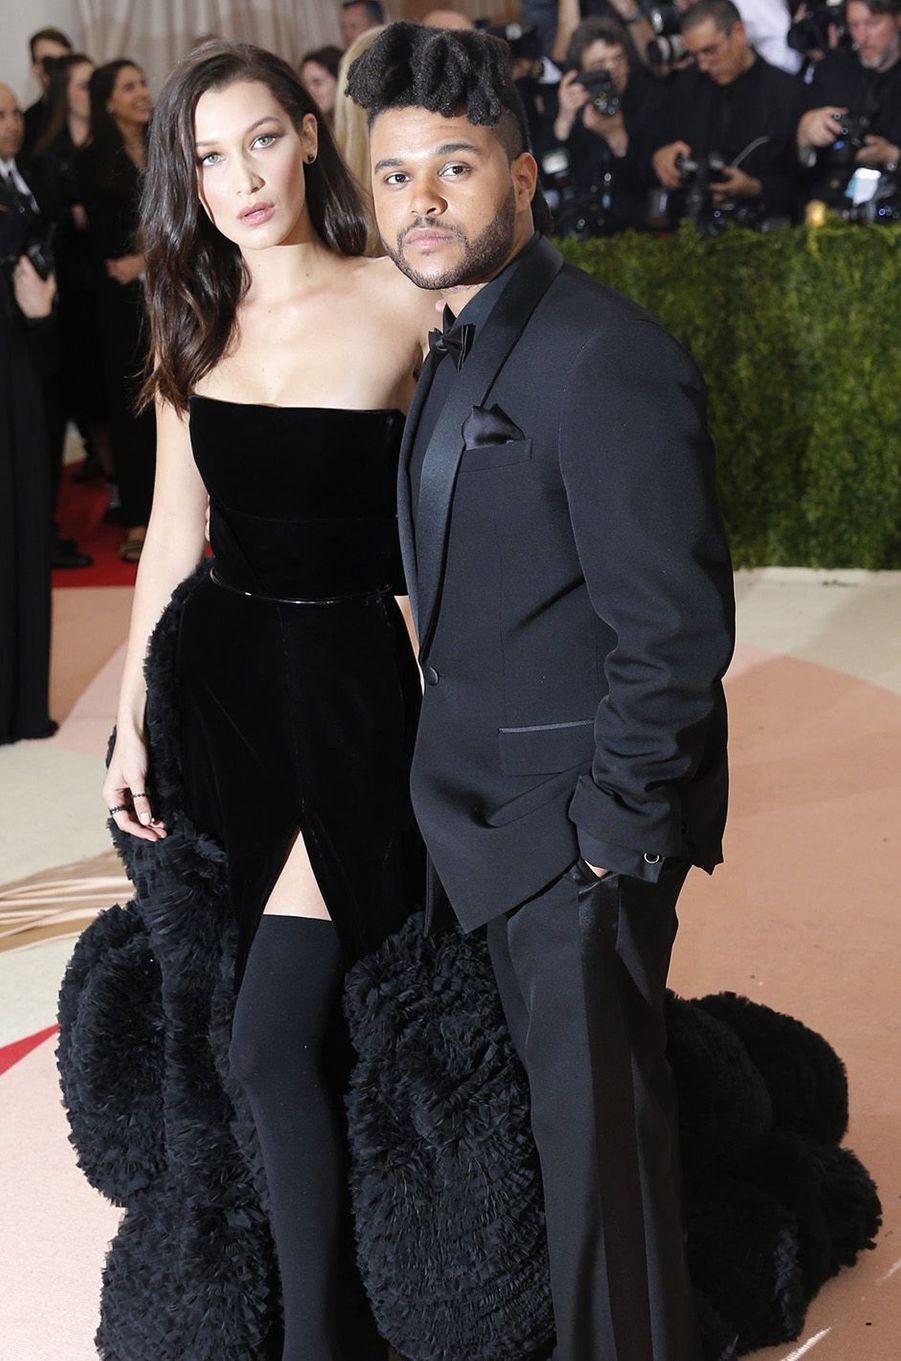 The Weeknd et sa compagne la sublime Bella Hadid au gala du MET, le 2 mai 2016